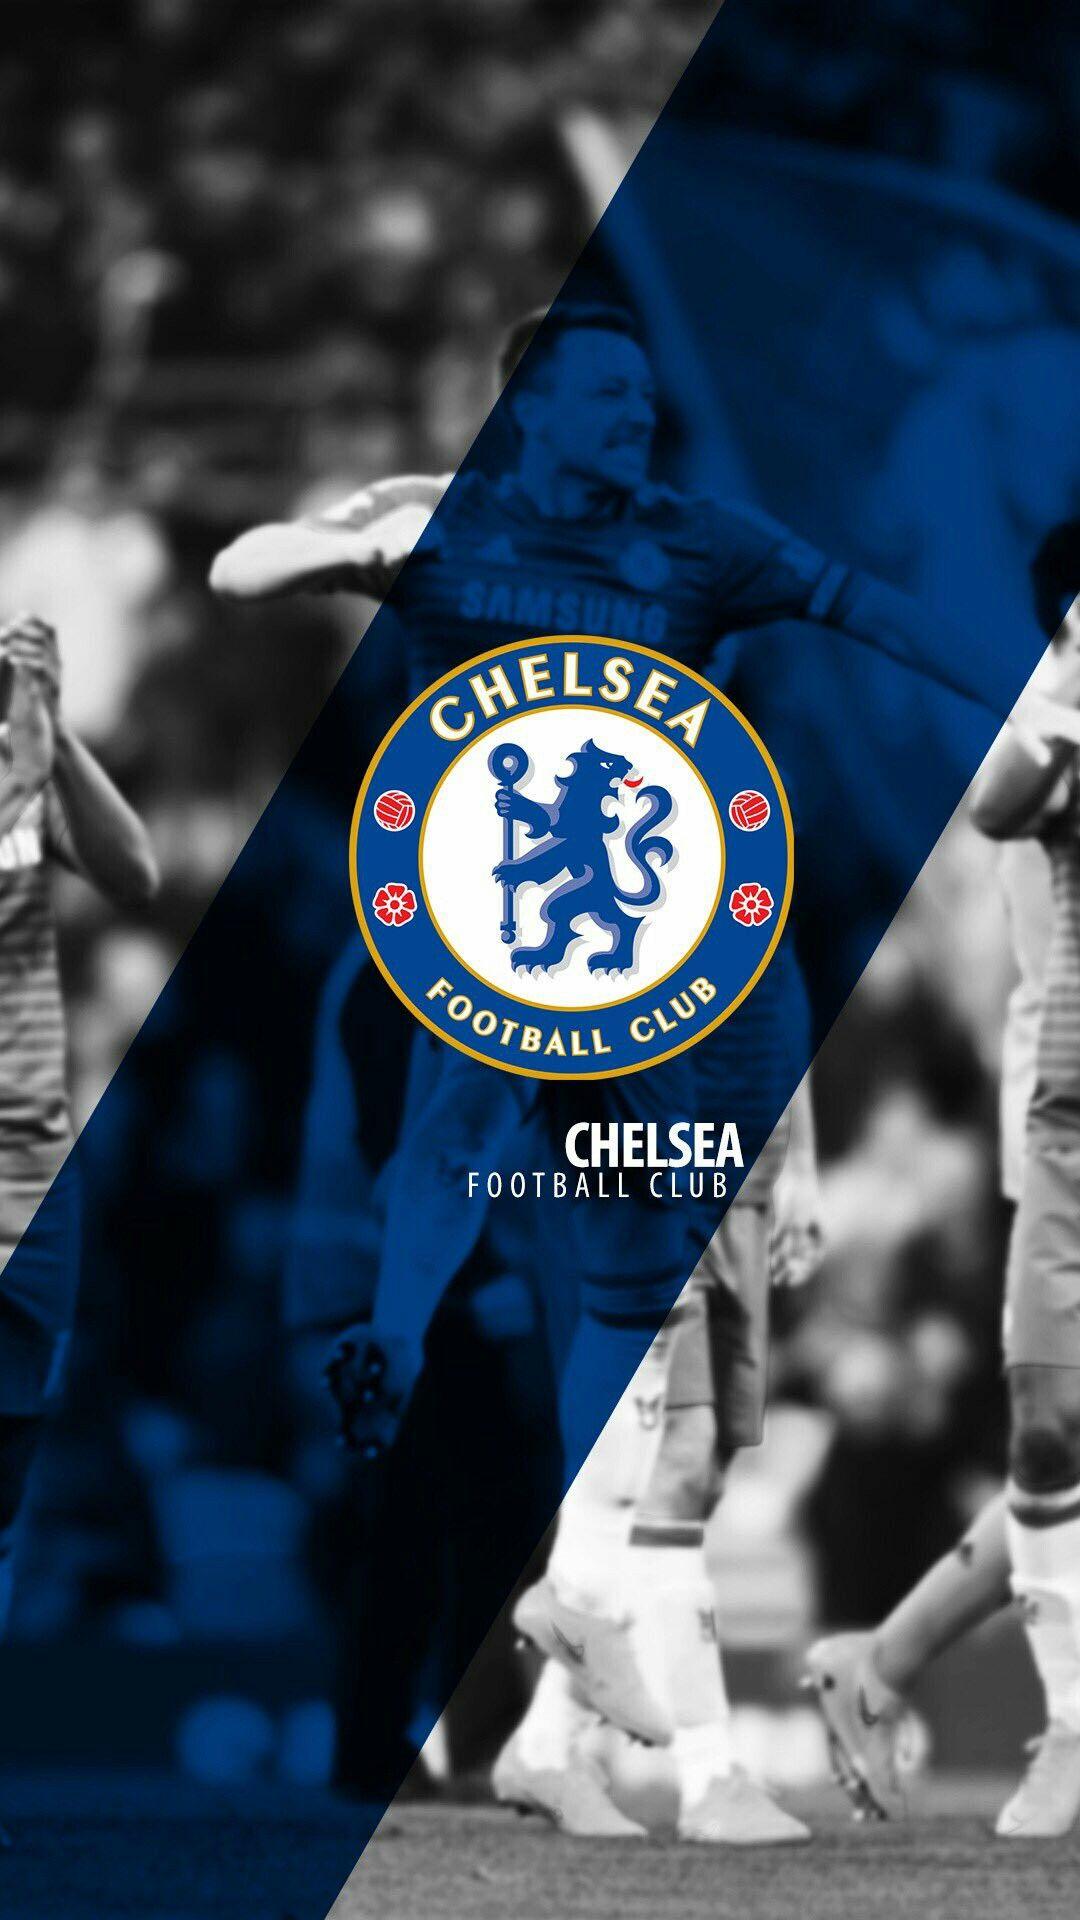 Edu Chelsea The Blues Sepak Bola Olahraga Desain